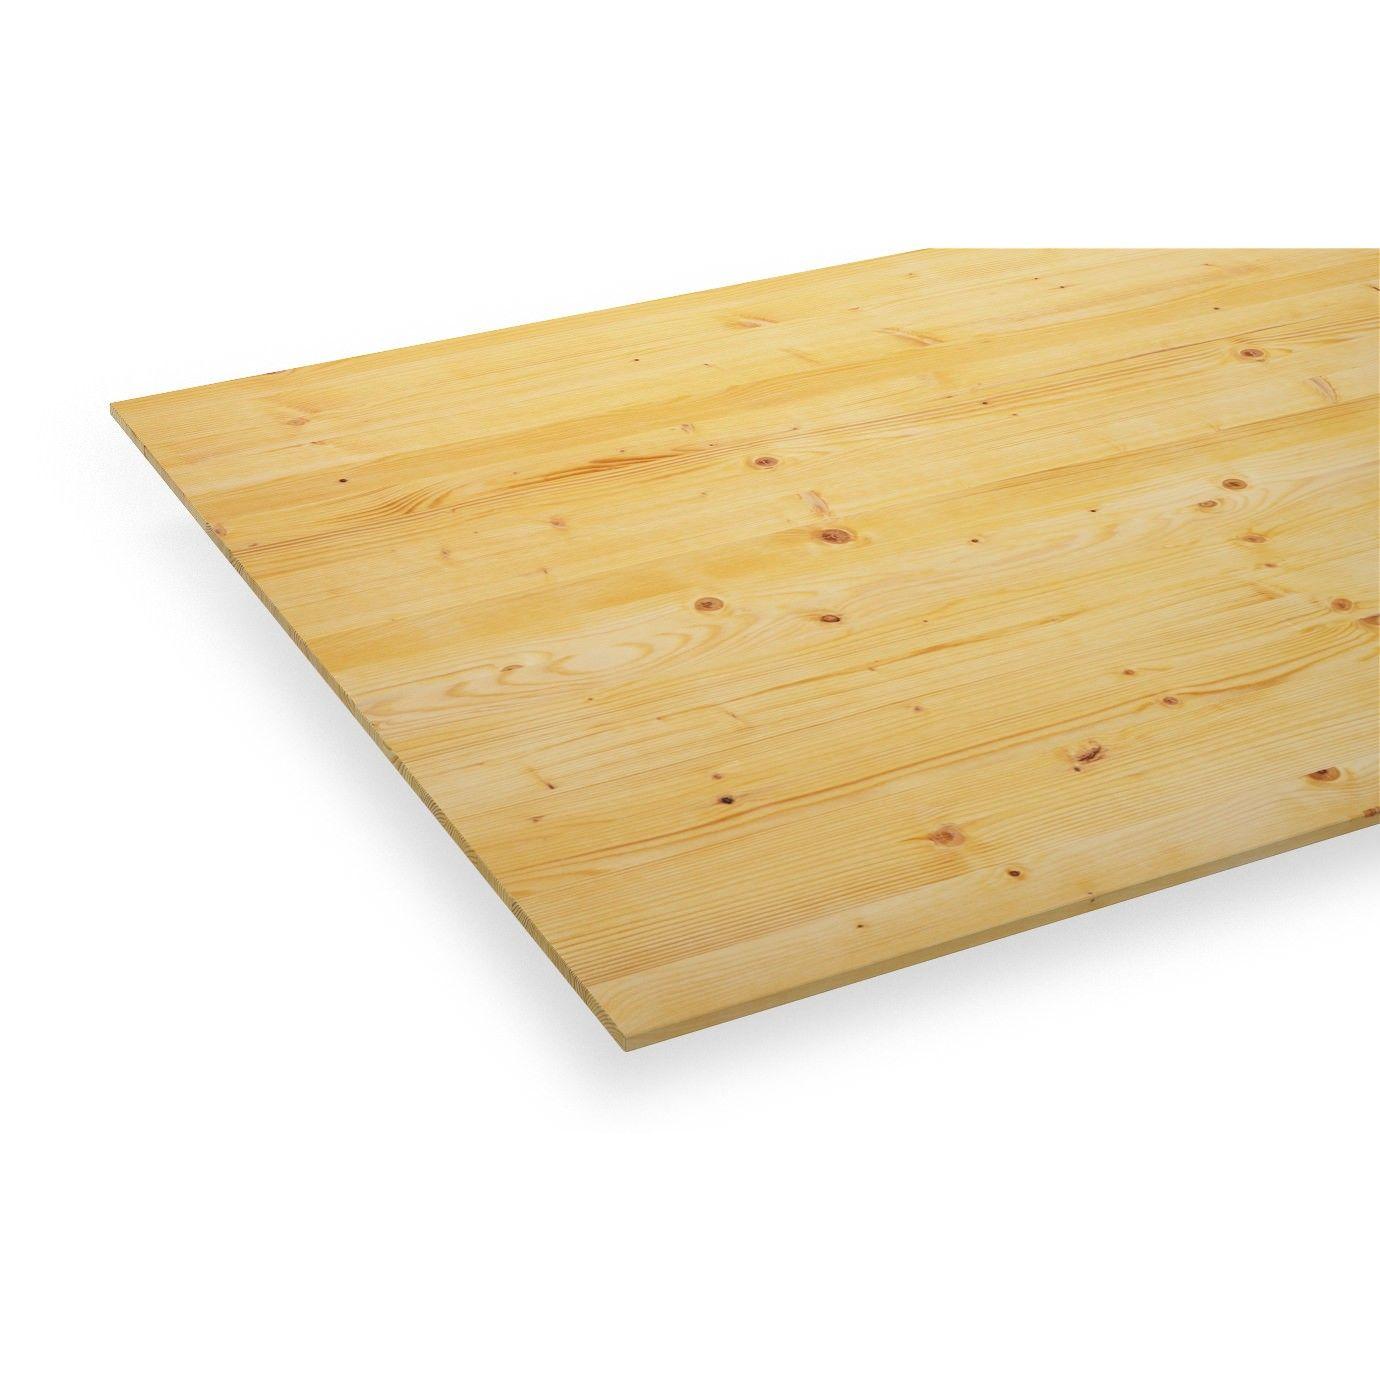 Lamina Jetzt bestellen unter: https://moebel.ladendirekt.de/wohnzimmer/tische/couchtische/?uid=26c86817-3bdc-5f99-b77c-f6a6c207a50a&utm_source=pinterest&utm_medium=pin&utm_campaign=boards #kiefer #tischplatten #wohnzimmer #couchtische #tische